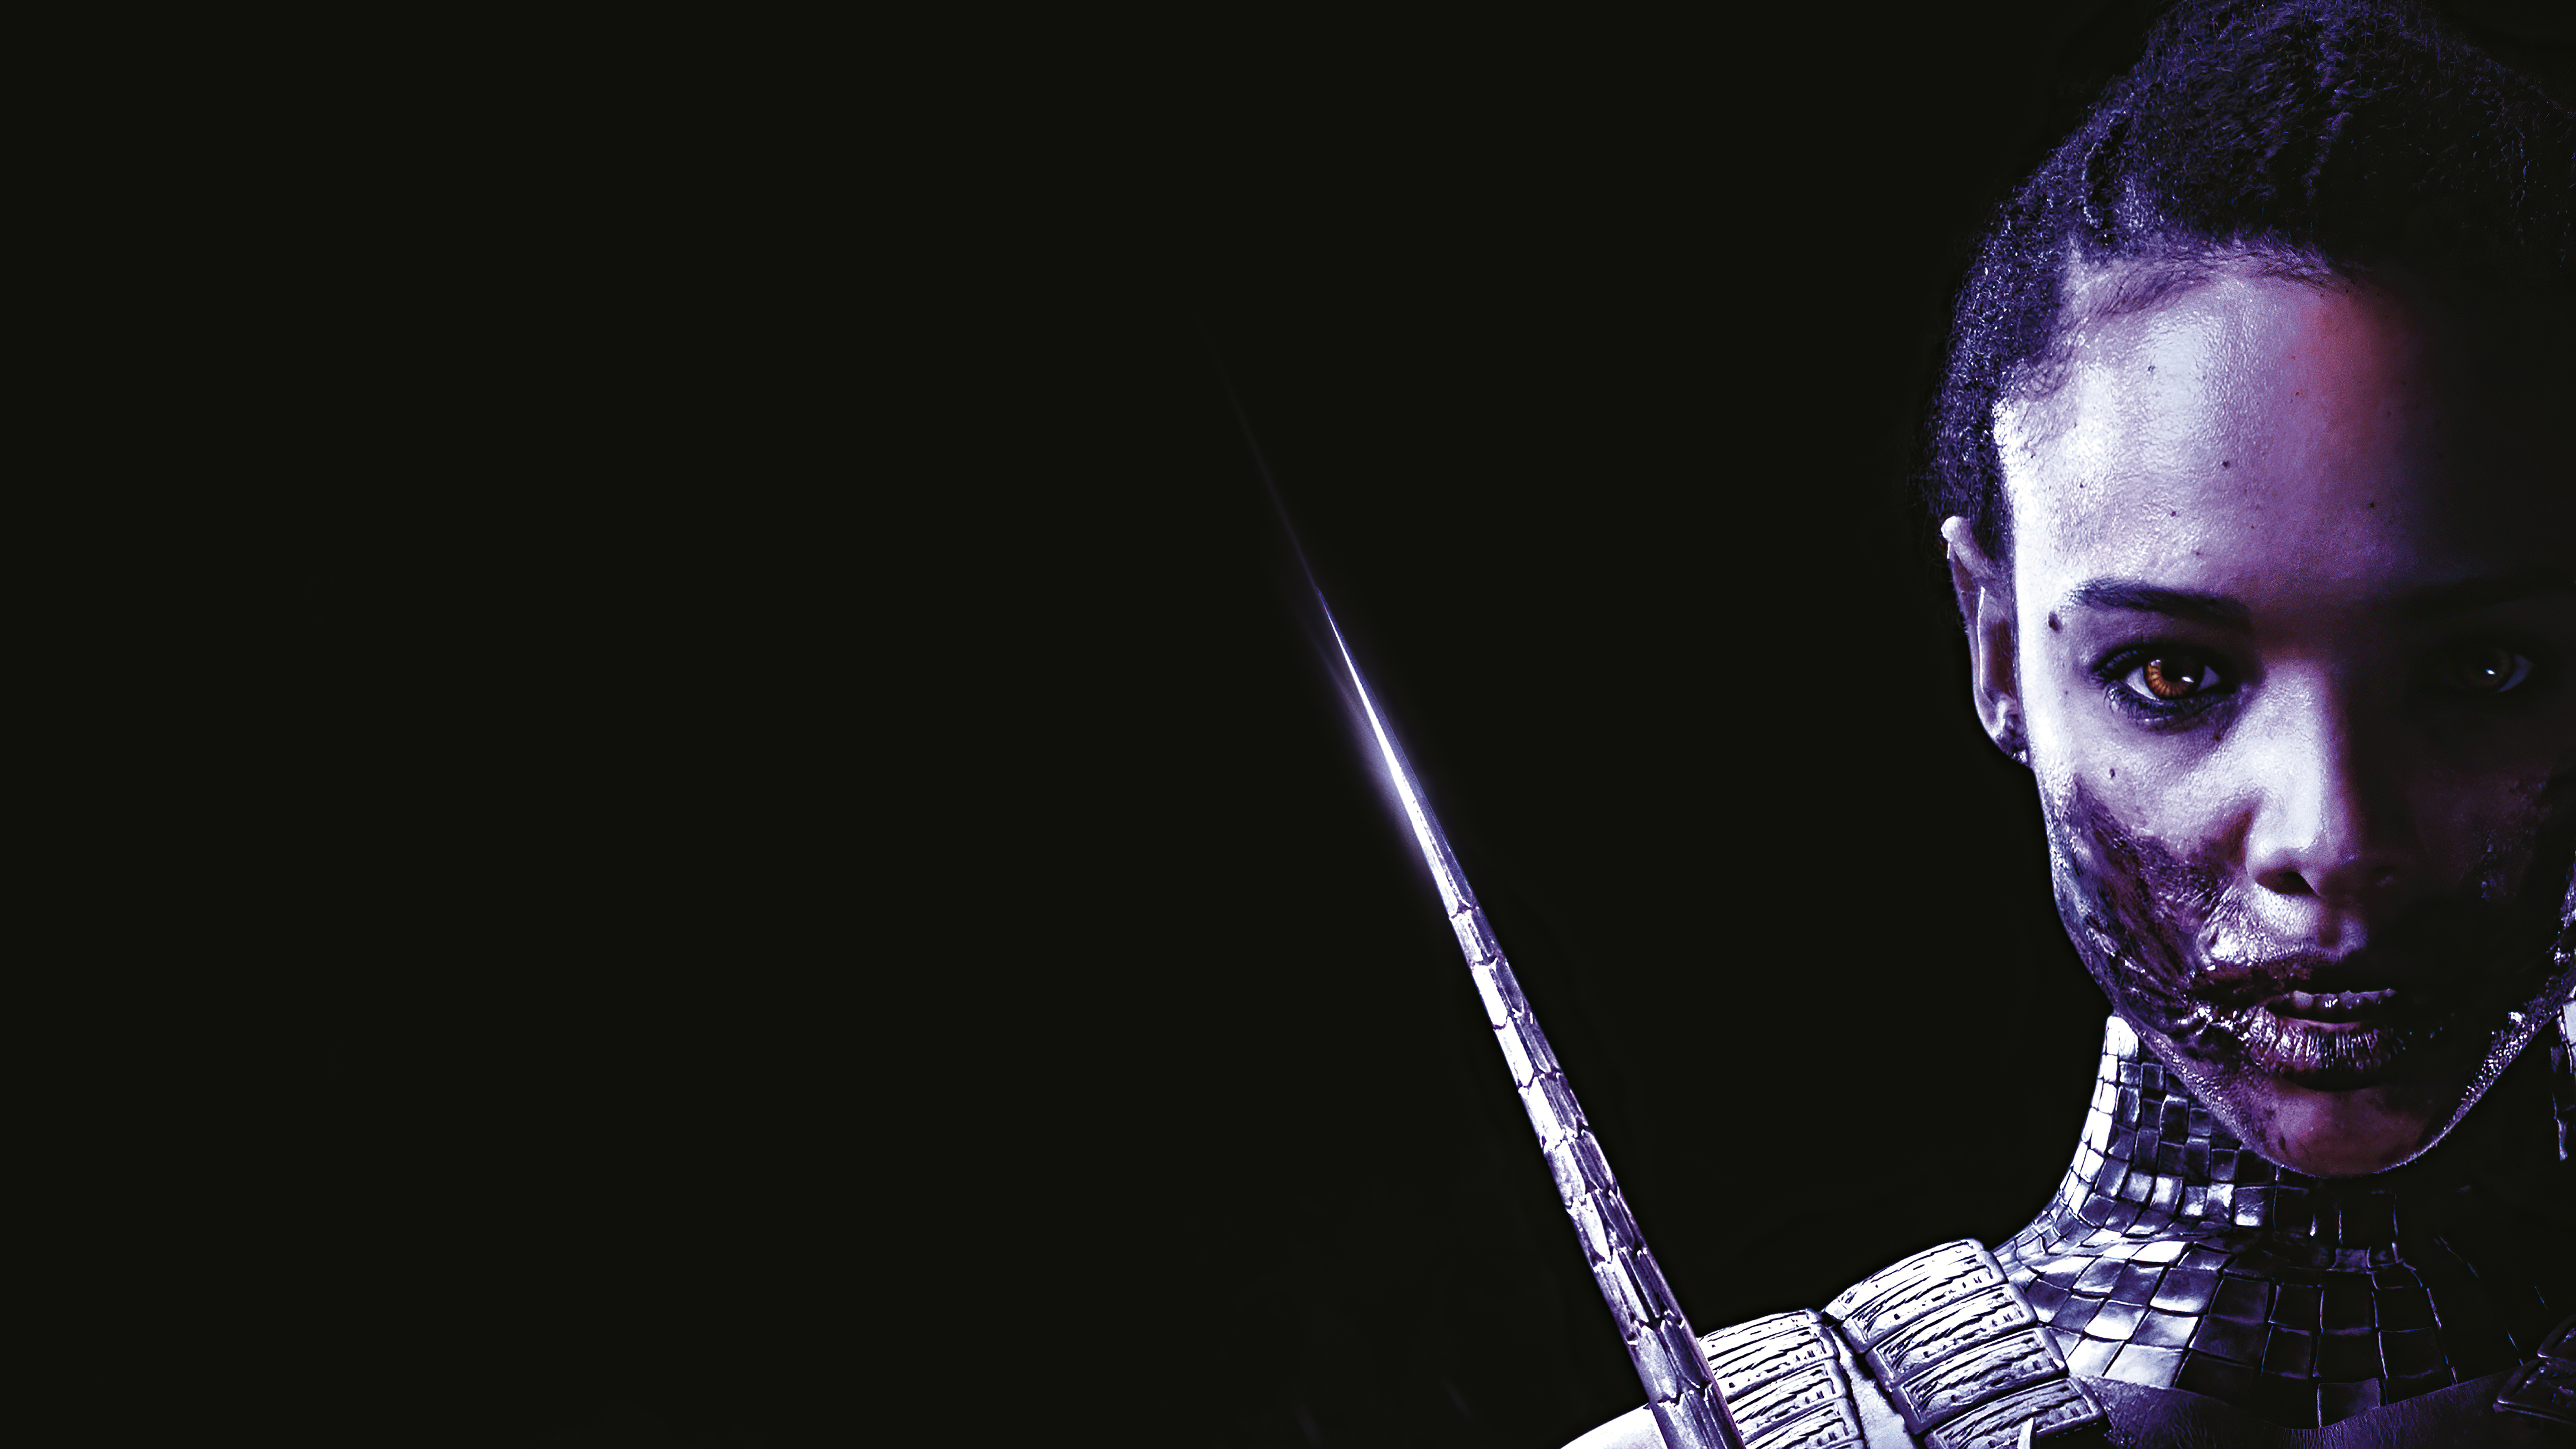 sisi stringer as mileena mortal kombat movie 4k 1617449109 - Sisi Stringer As Mileena Mortal Kombat Movie 4k - Sisi Stringer As Mileena Mortal Kombat Movie 4k wallpapers